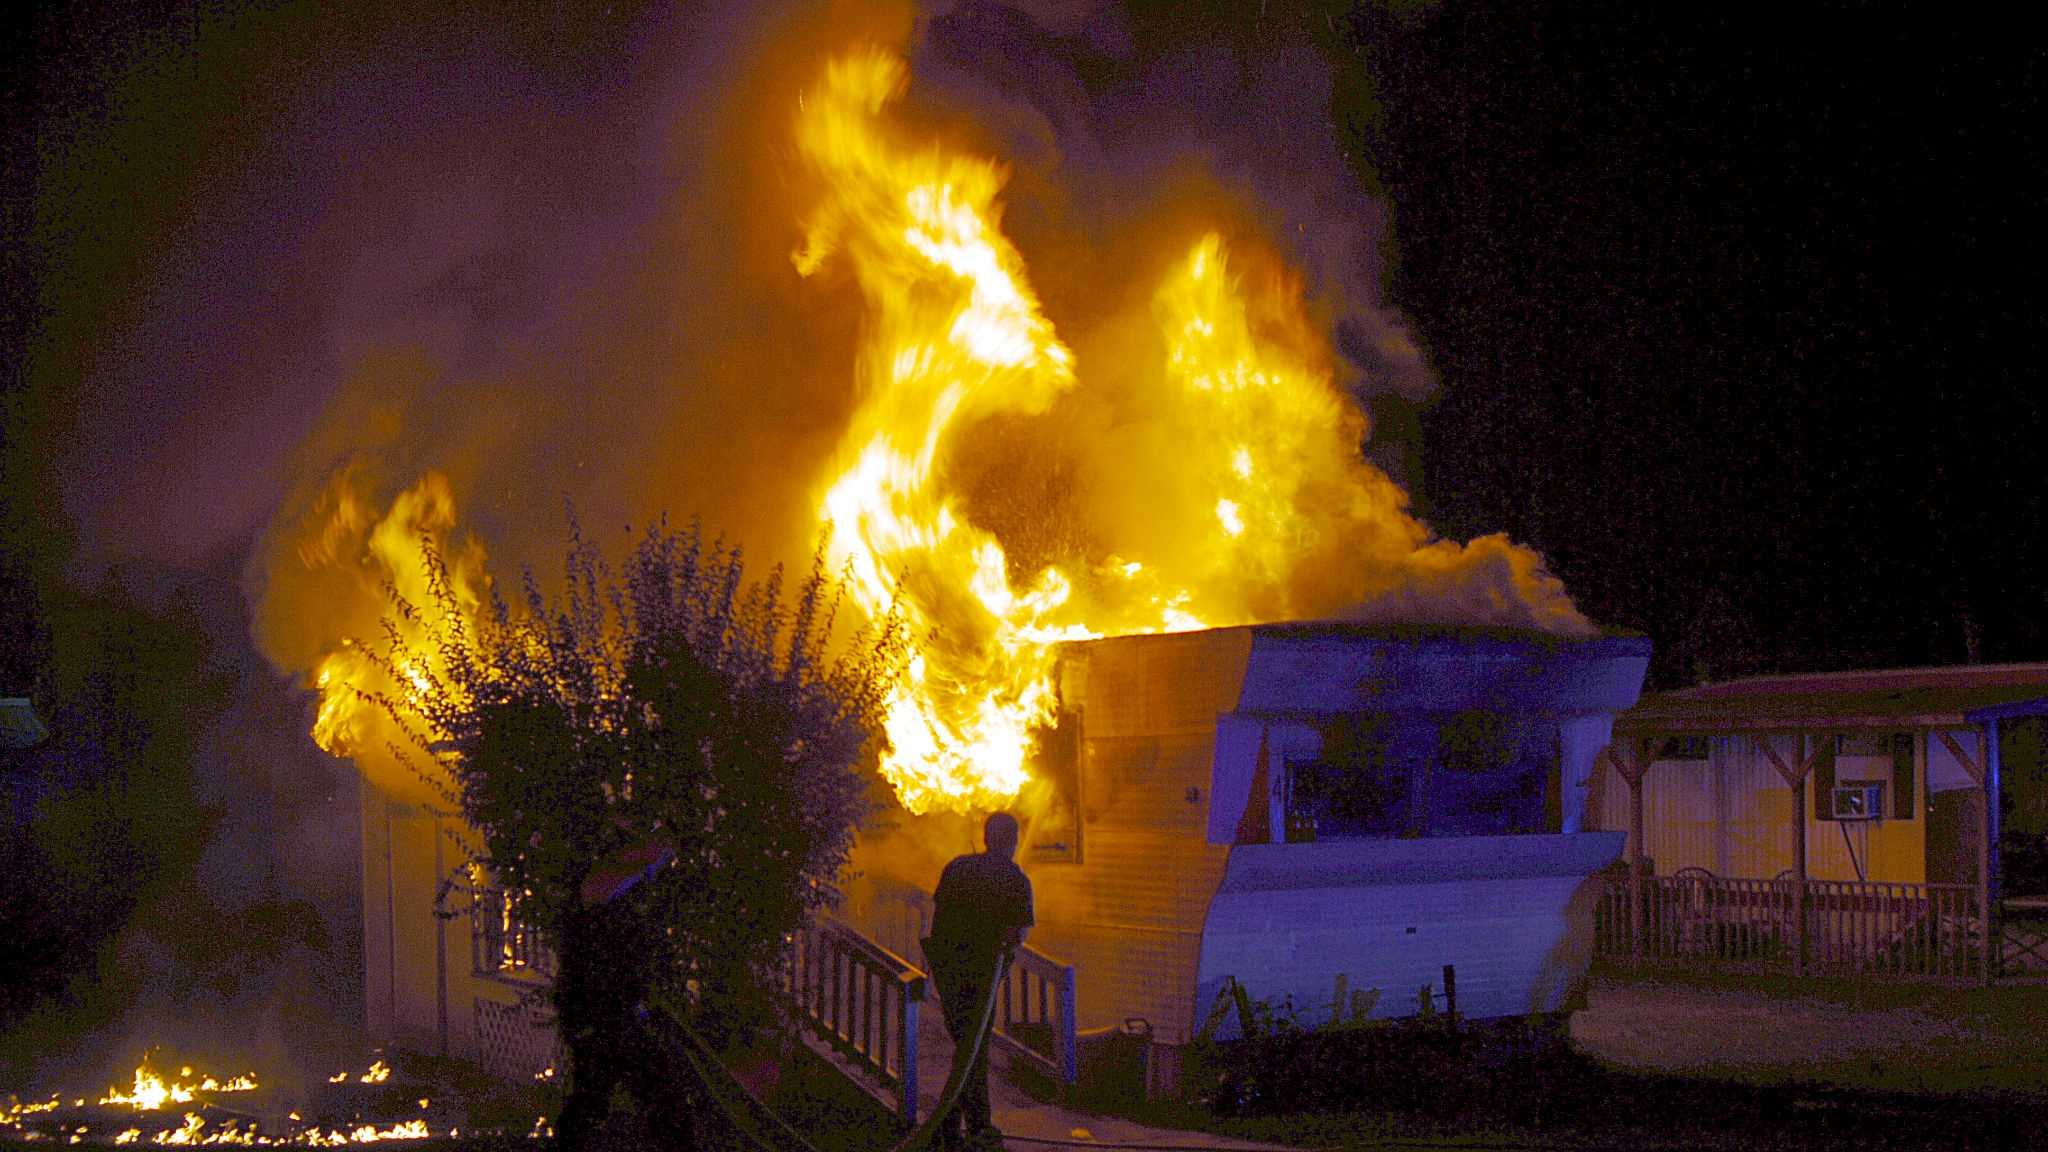 Fatal fire Greenfield